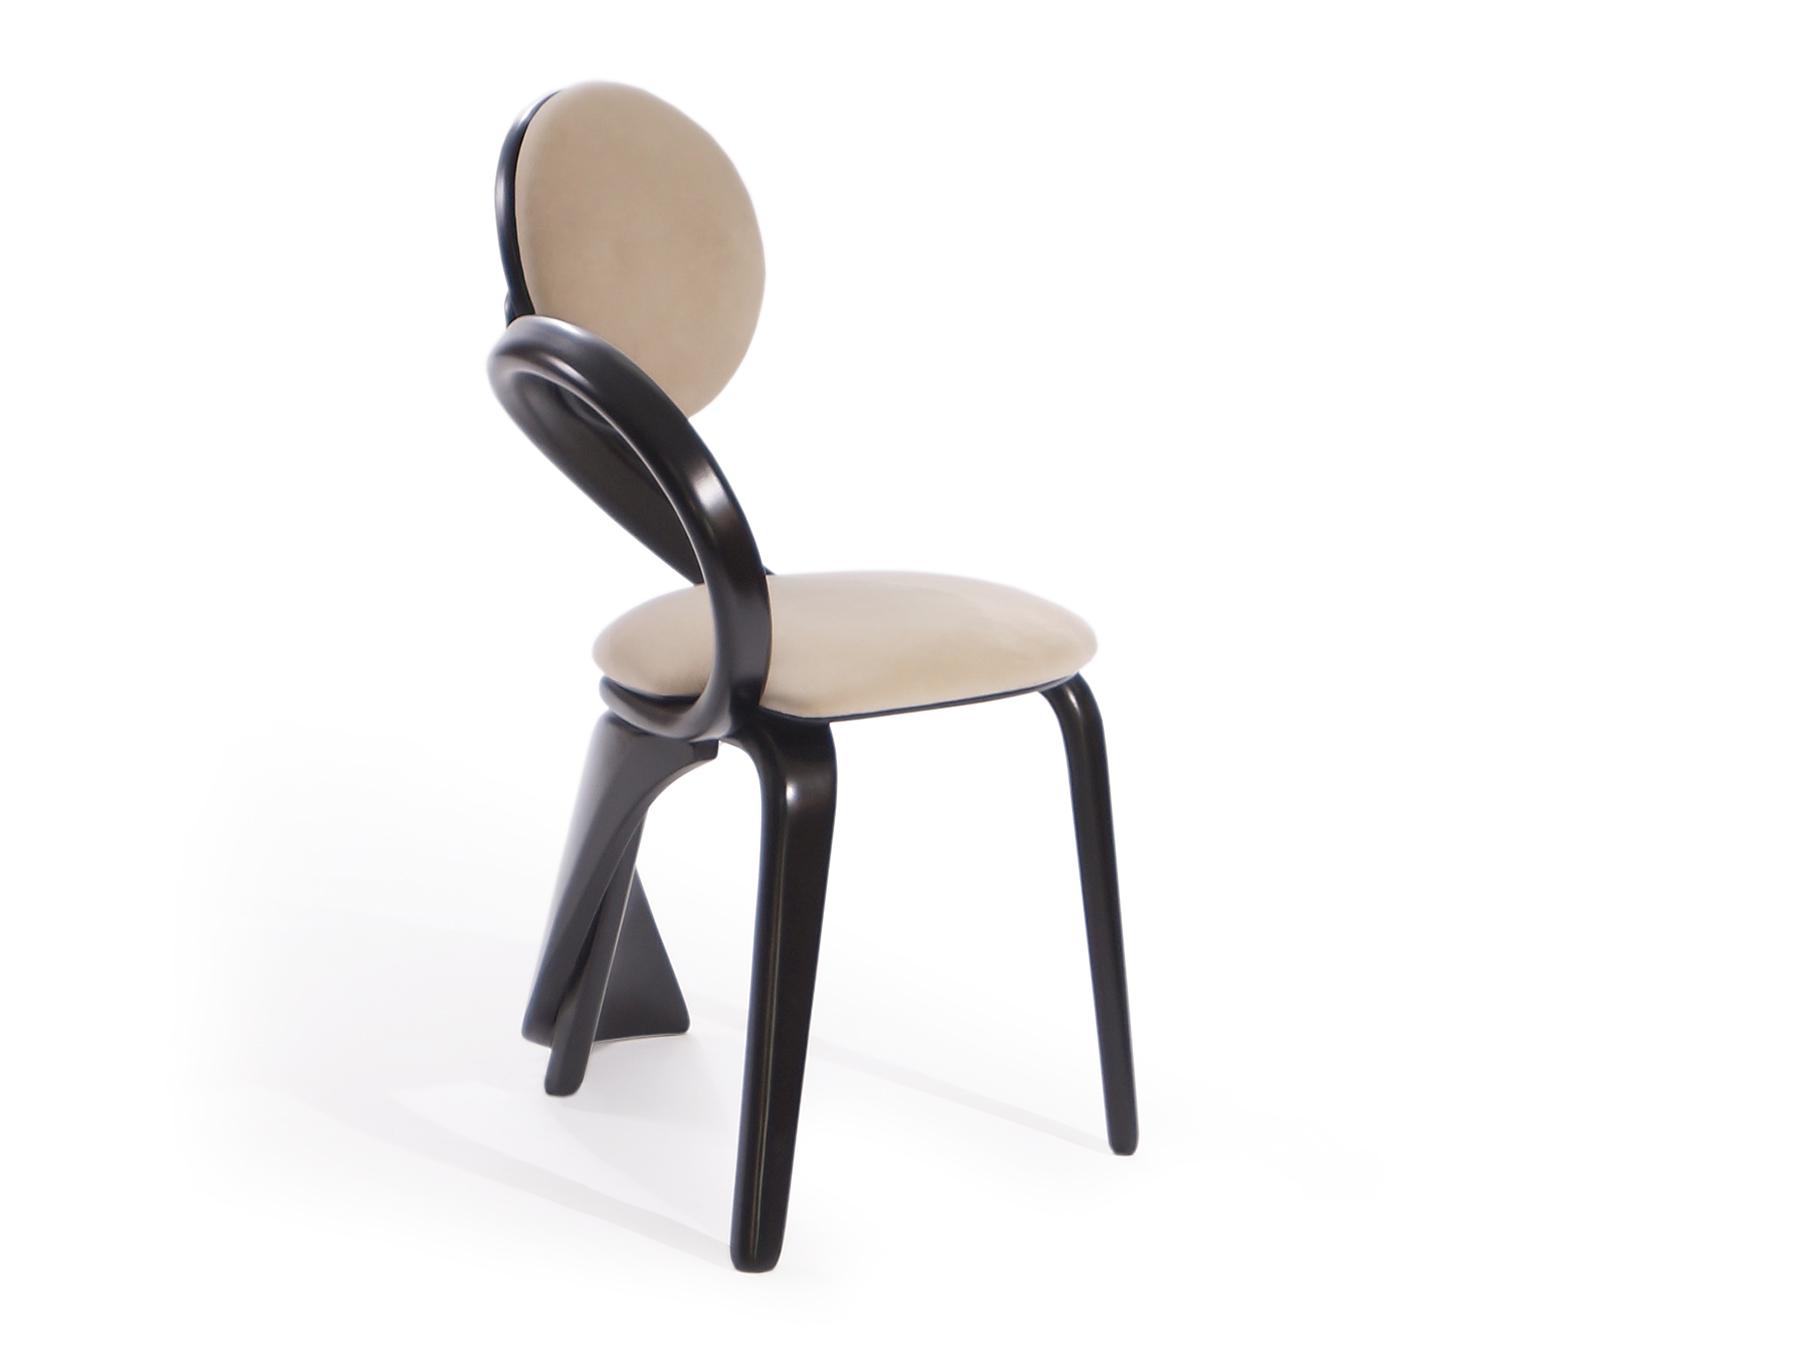 Кухонный стул ActualDesign 15429524 от thefurnish